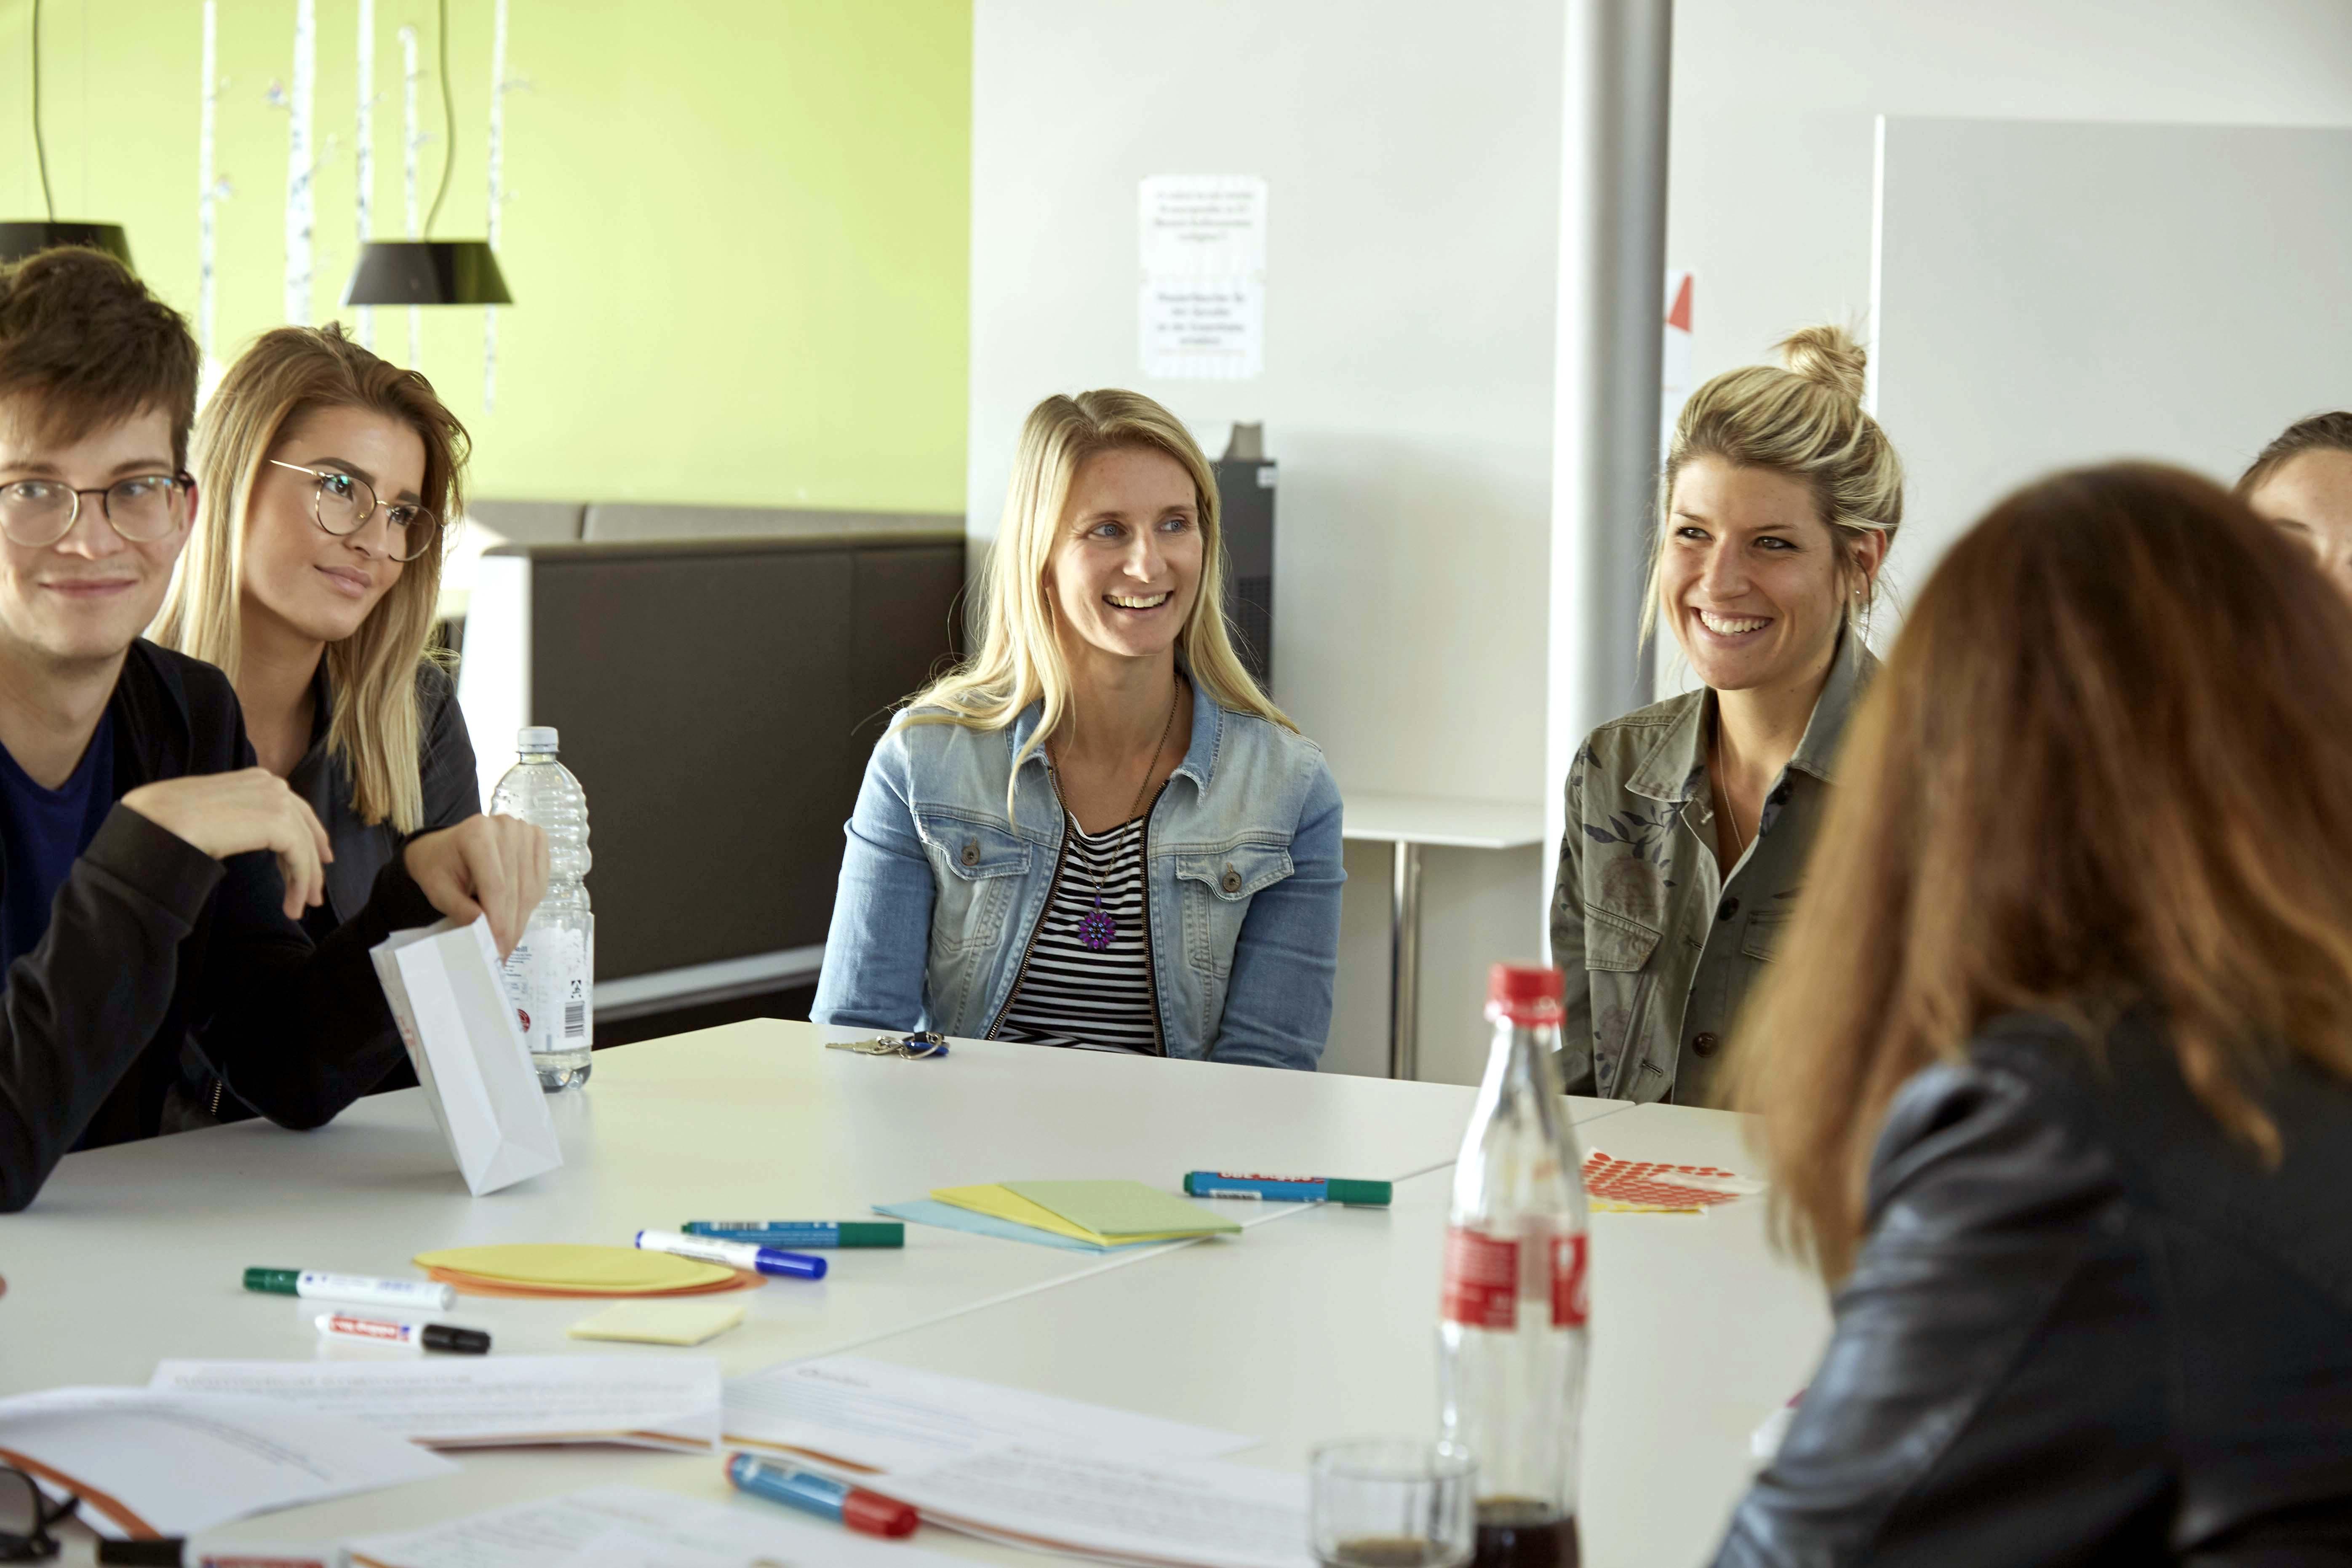 Unsere Kultur - Kommunikation - KLiNGEL Gruppe